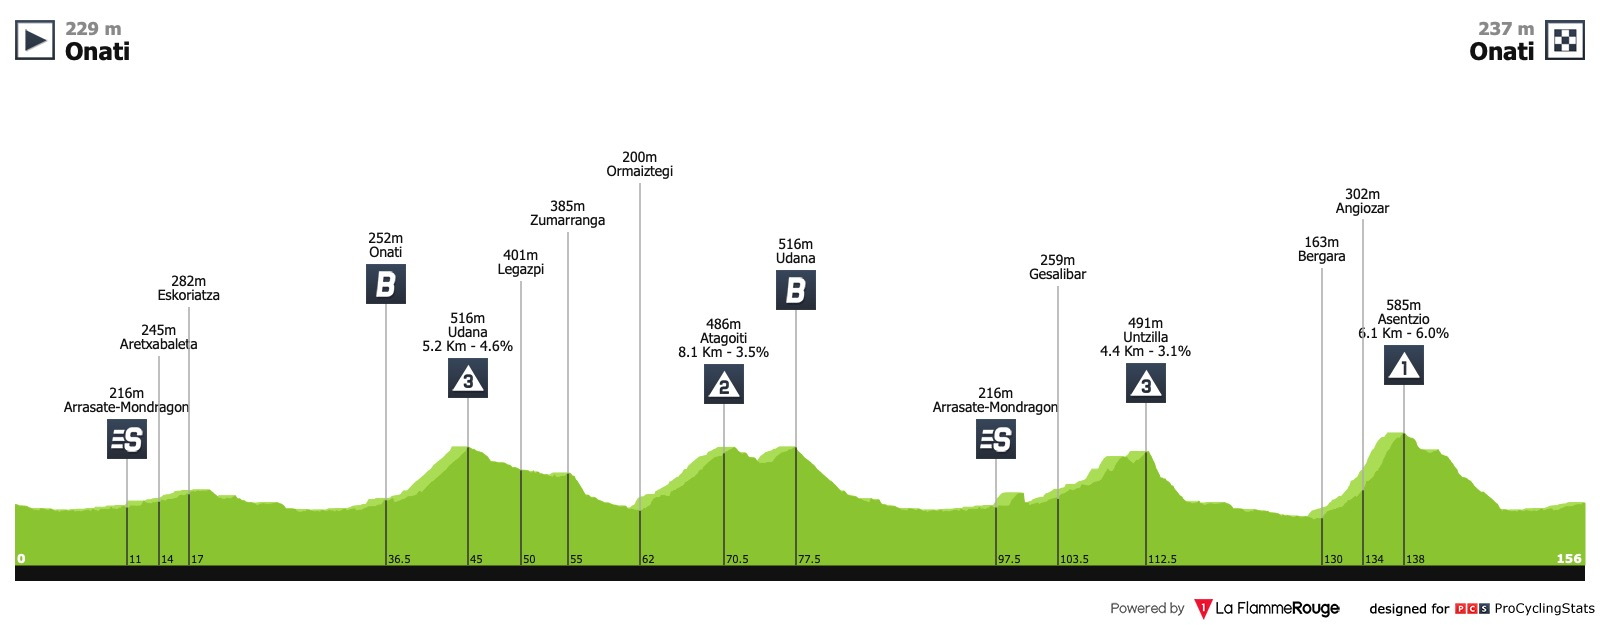 Le topic du cyclisme féminin - Page 47 Iurreta-emakumeen-bira-2019-stage-4-profile-a469aef70b